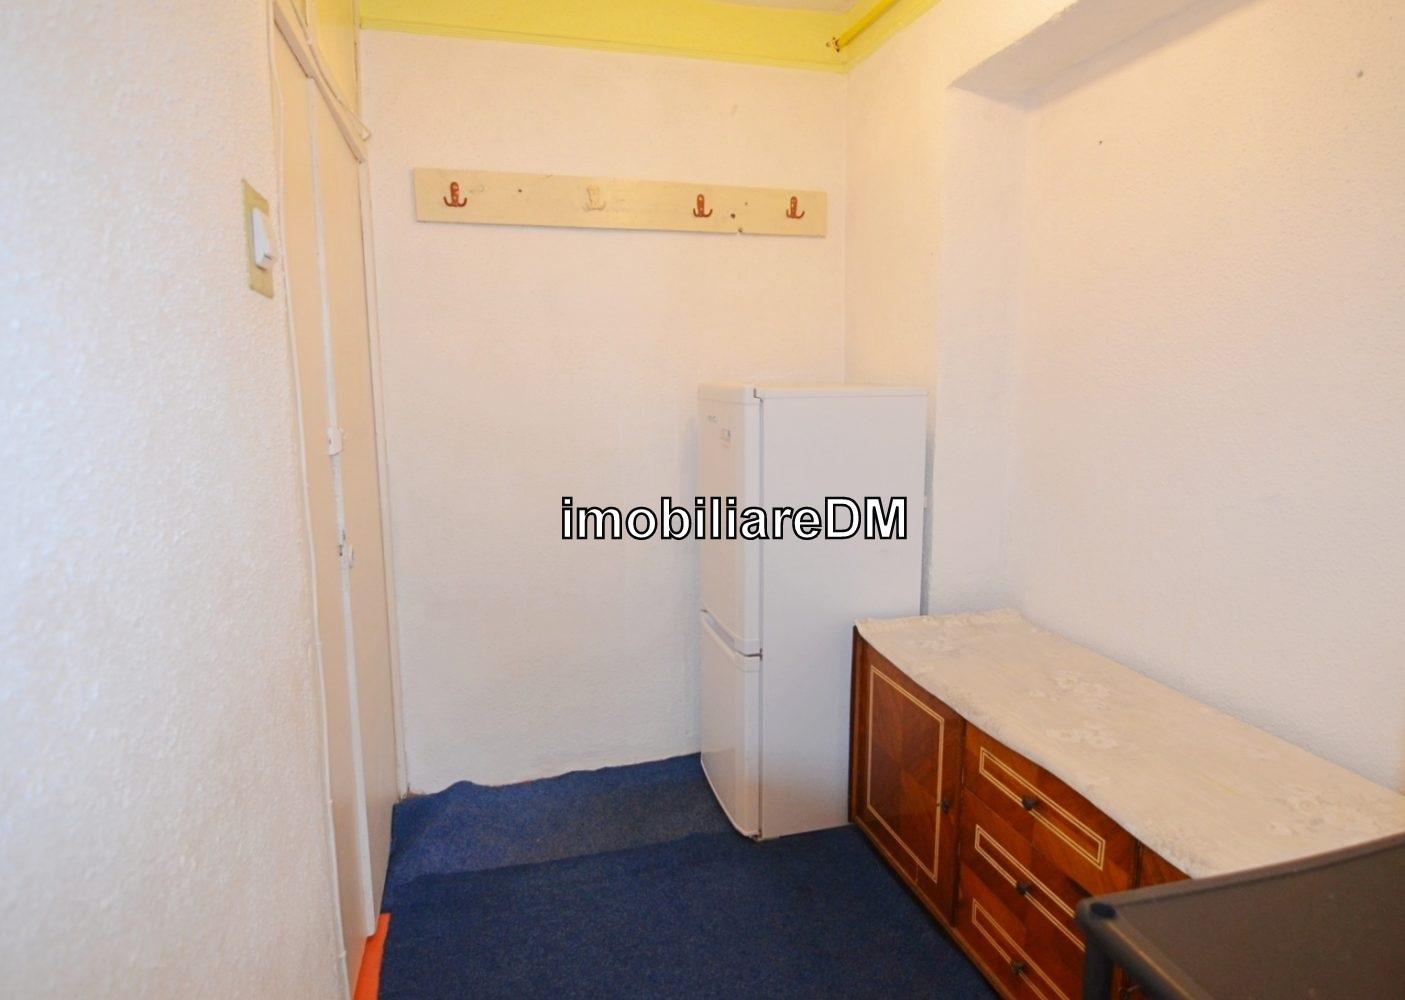 inchiriere apartament IASI imobiliareDM 1PACSDFGBXCVGF5236314